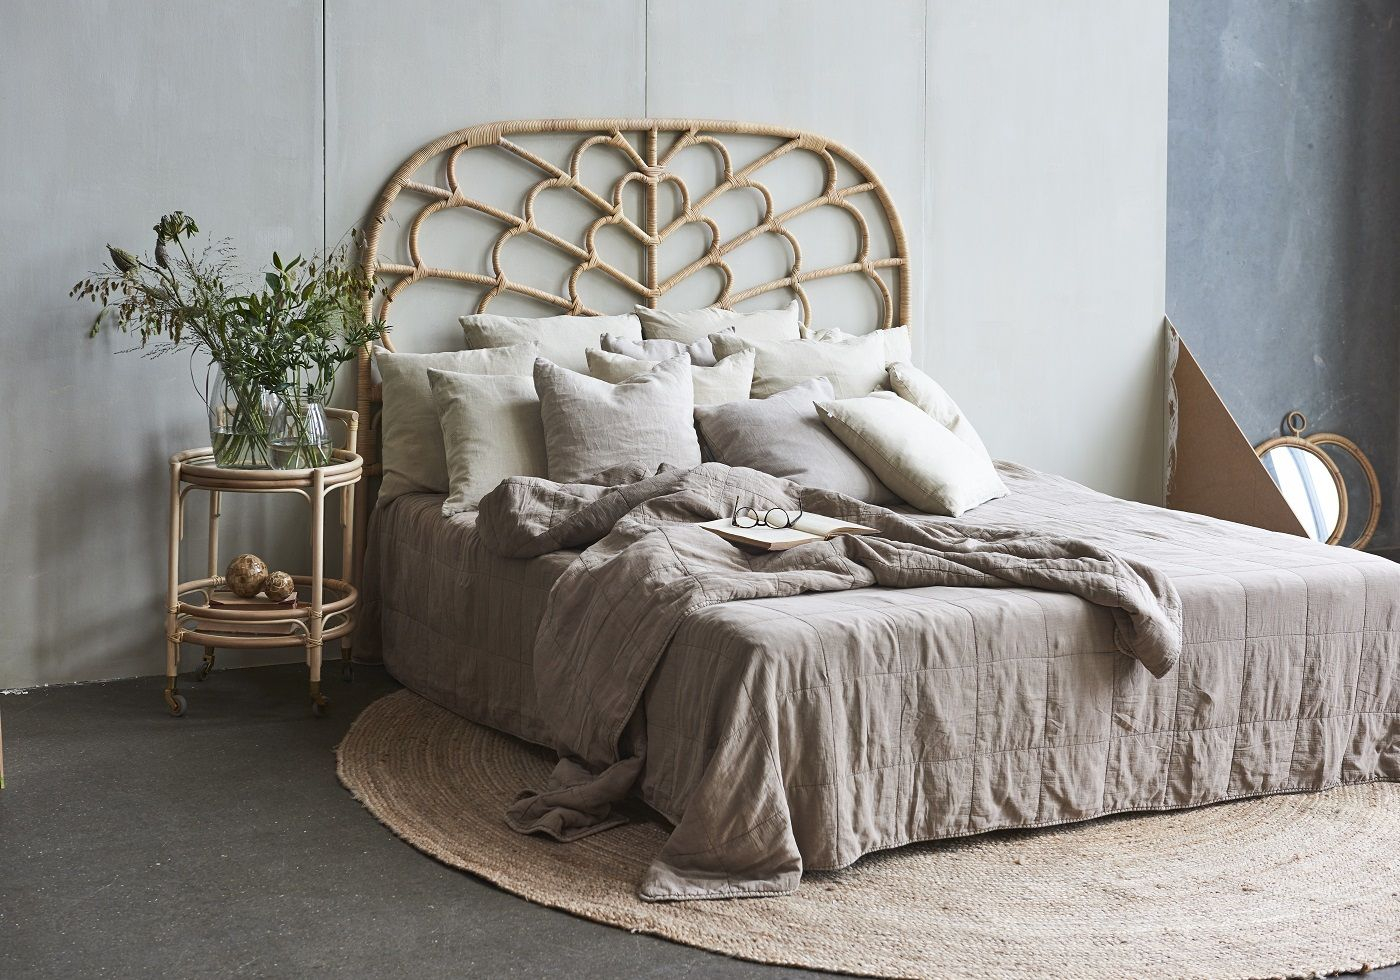 Sika-Design Celia Sengegavl - Natur - Originals by Sika-Design